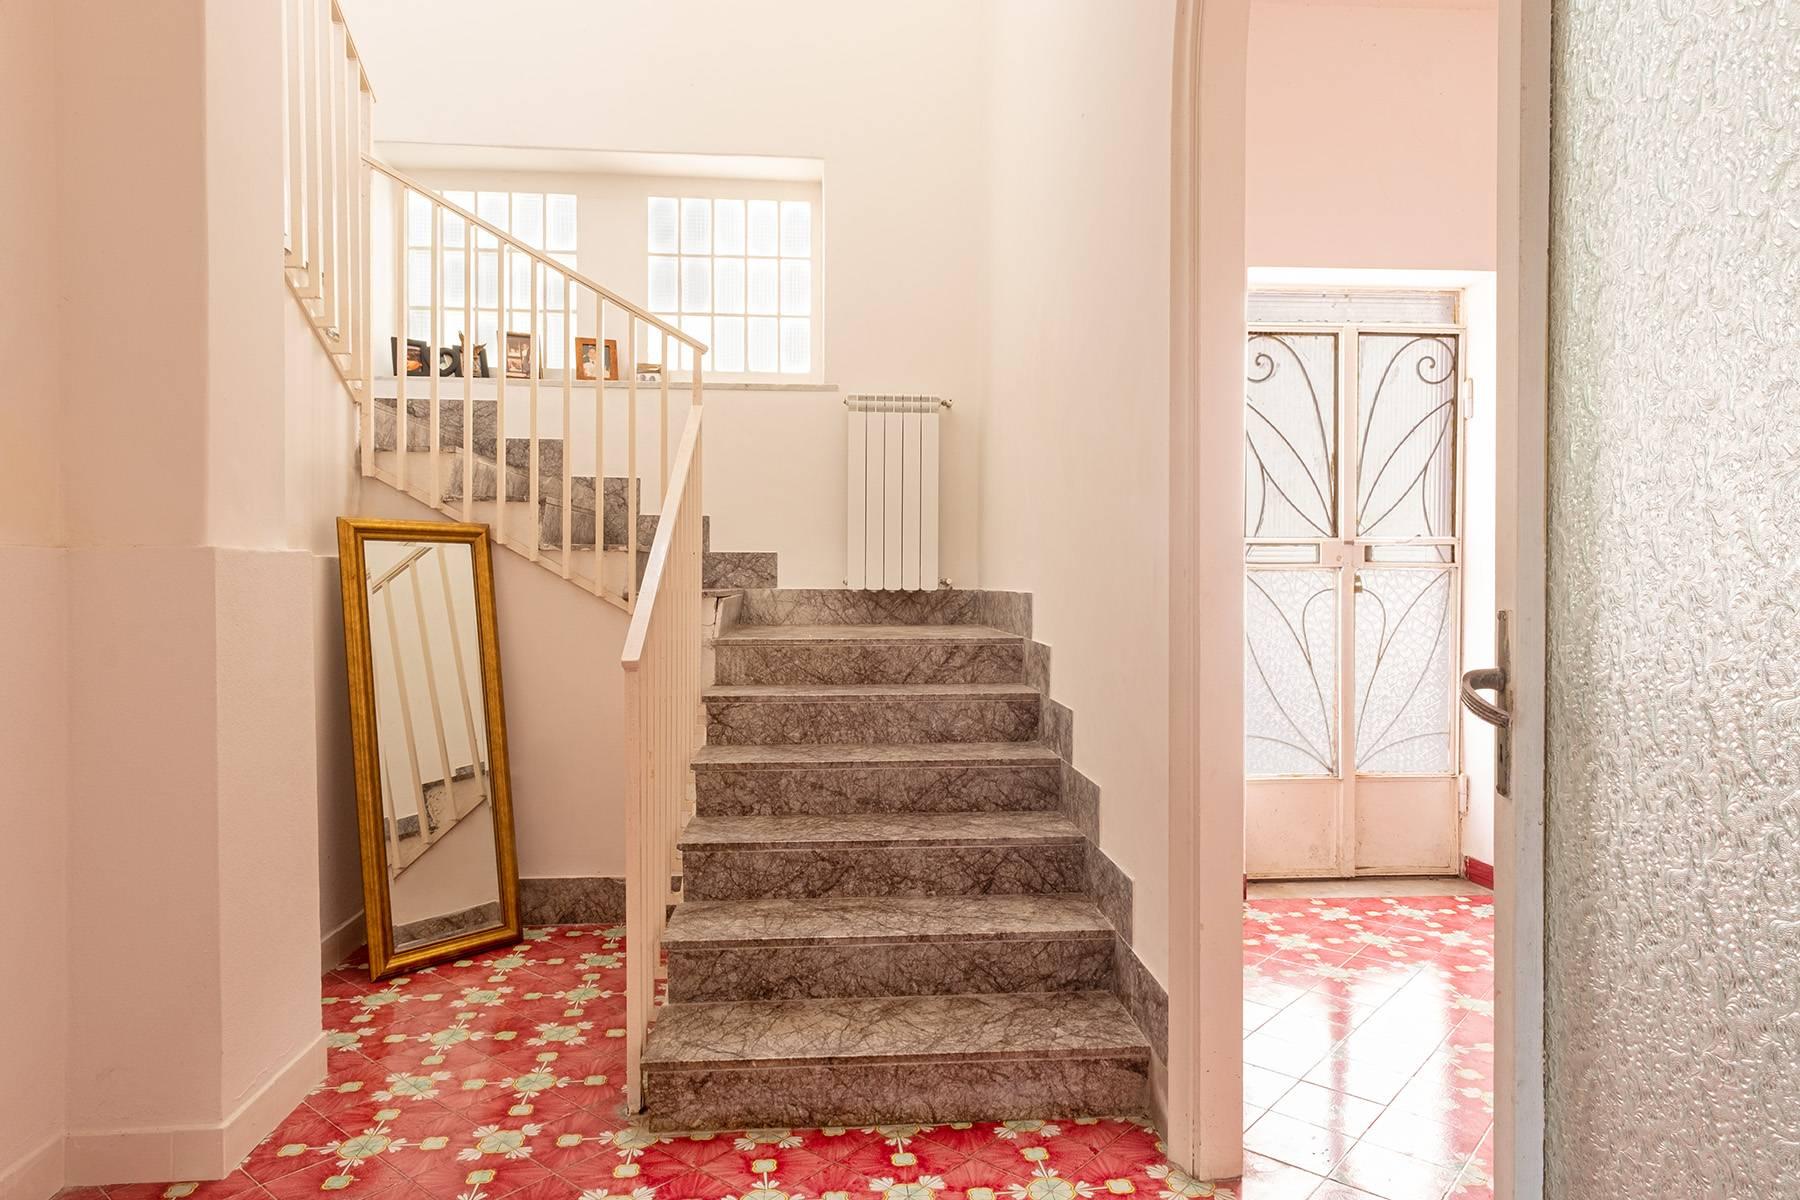 Casa indipendente in Vendita a Procida: 5 locali, 300 mq - Foto 14